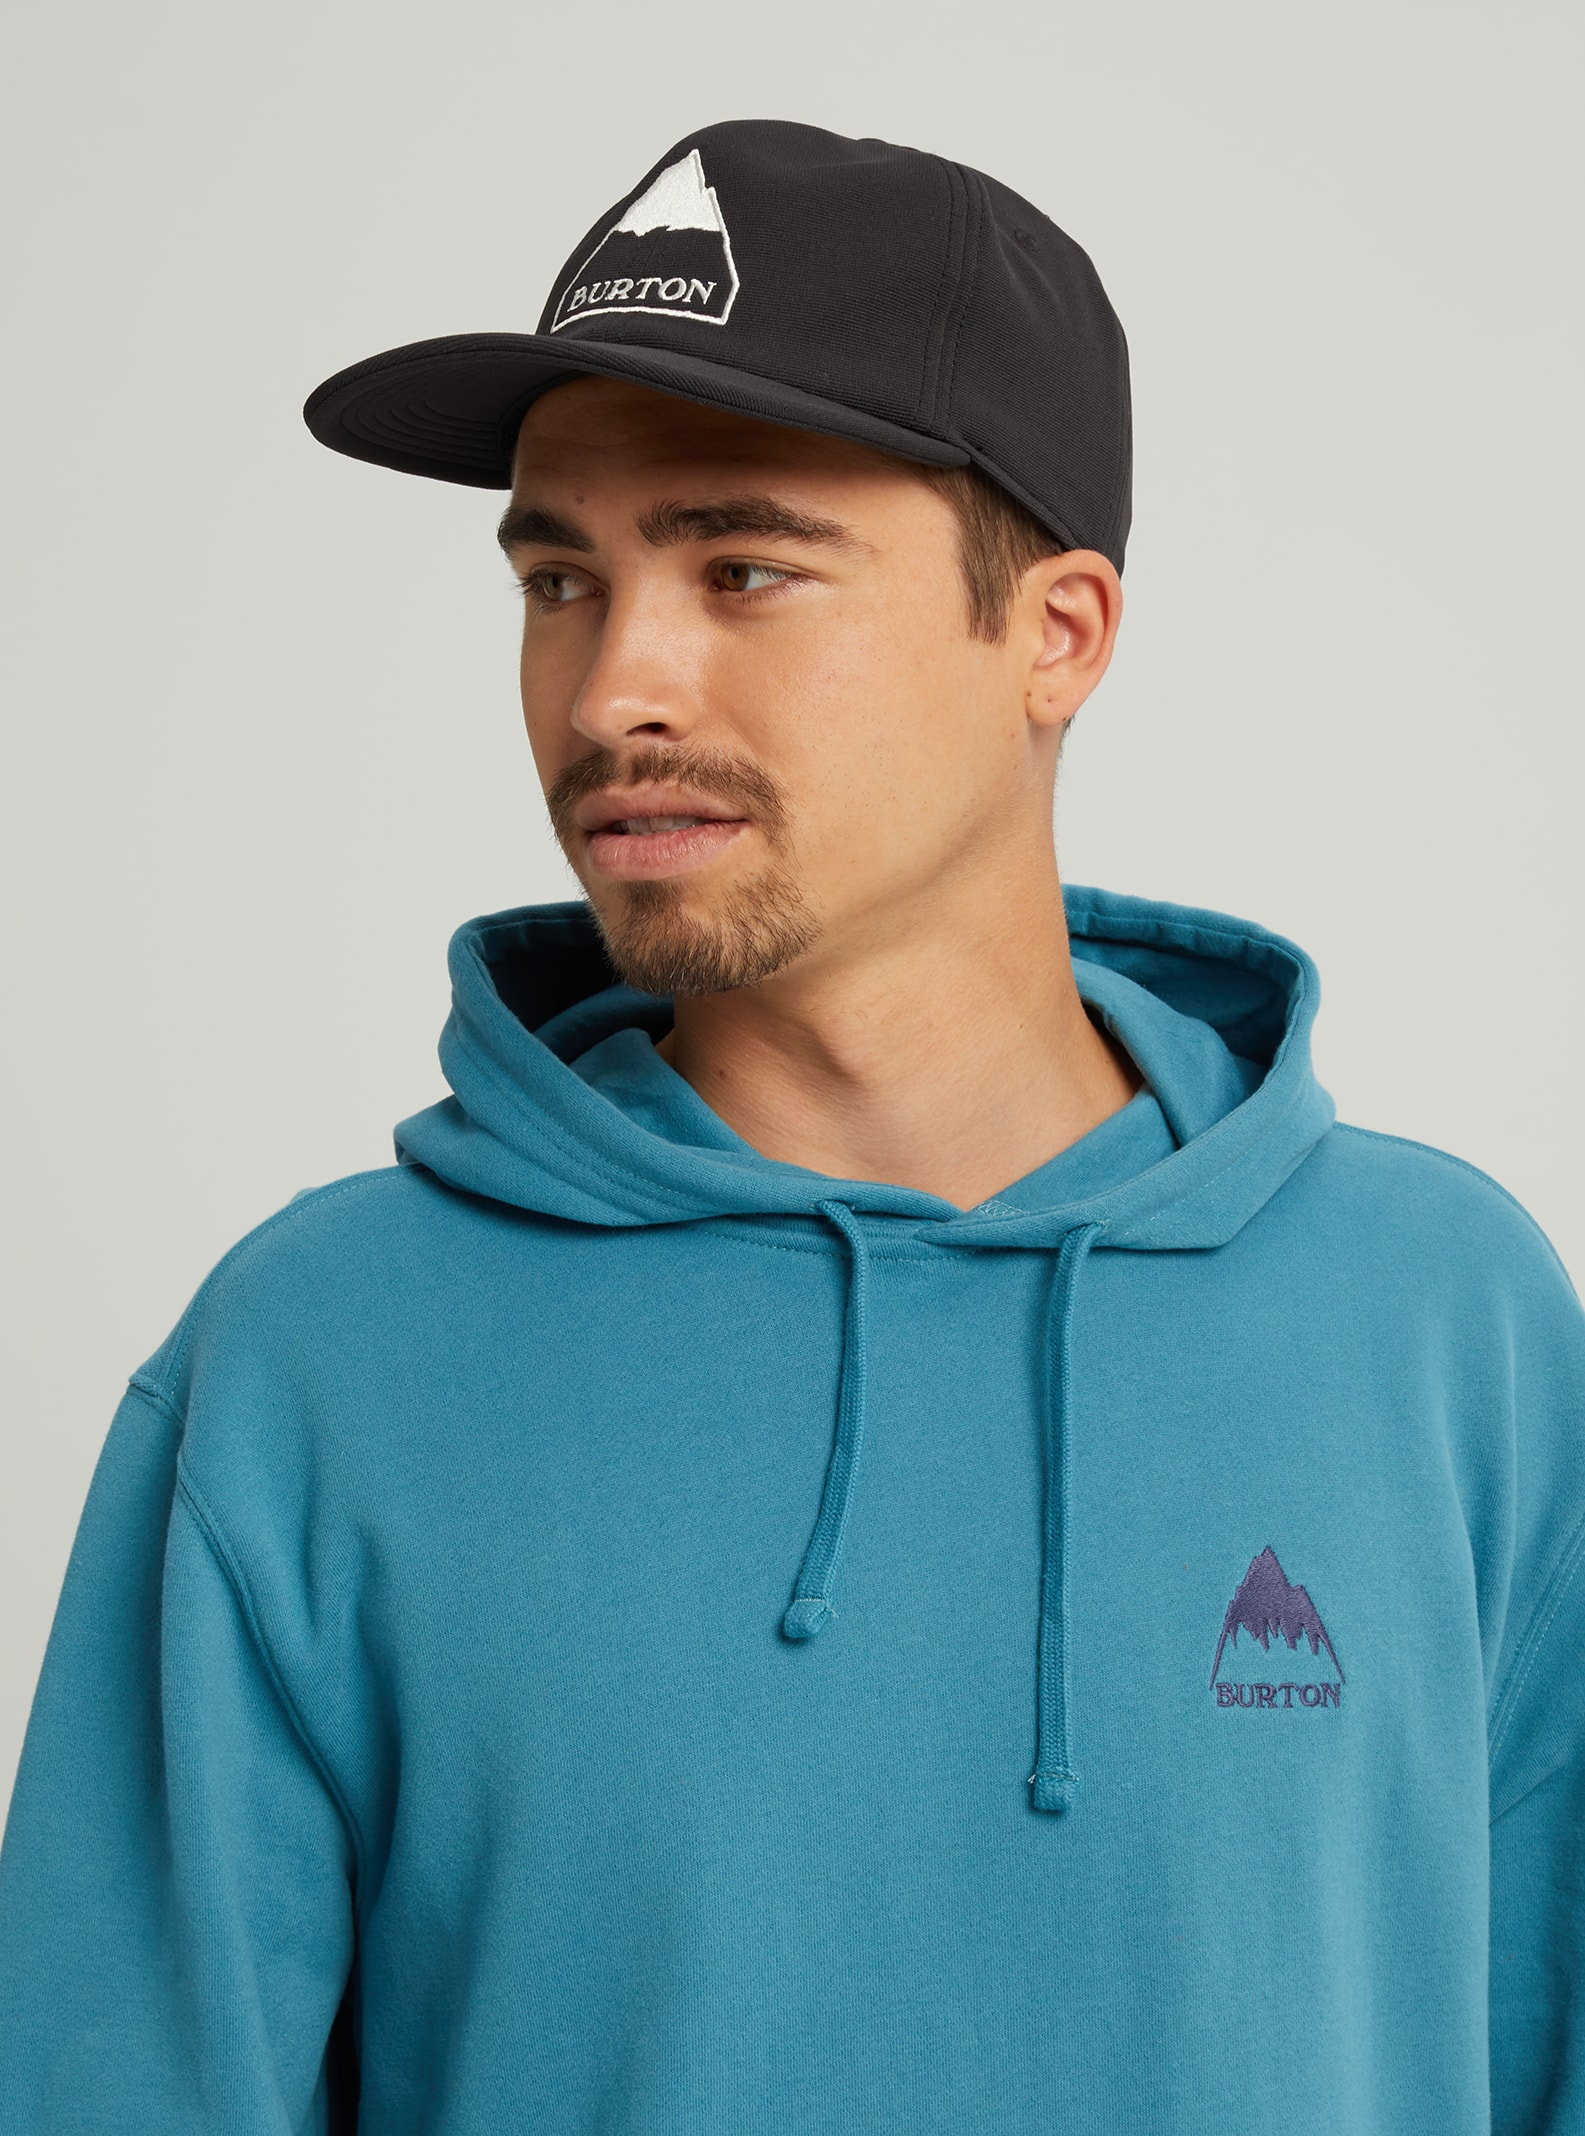 Men's Hats & Beanies | Burton Snowboards